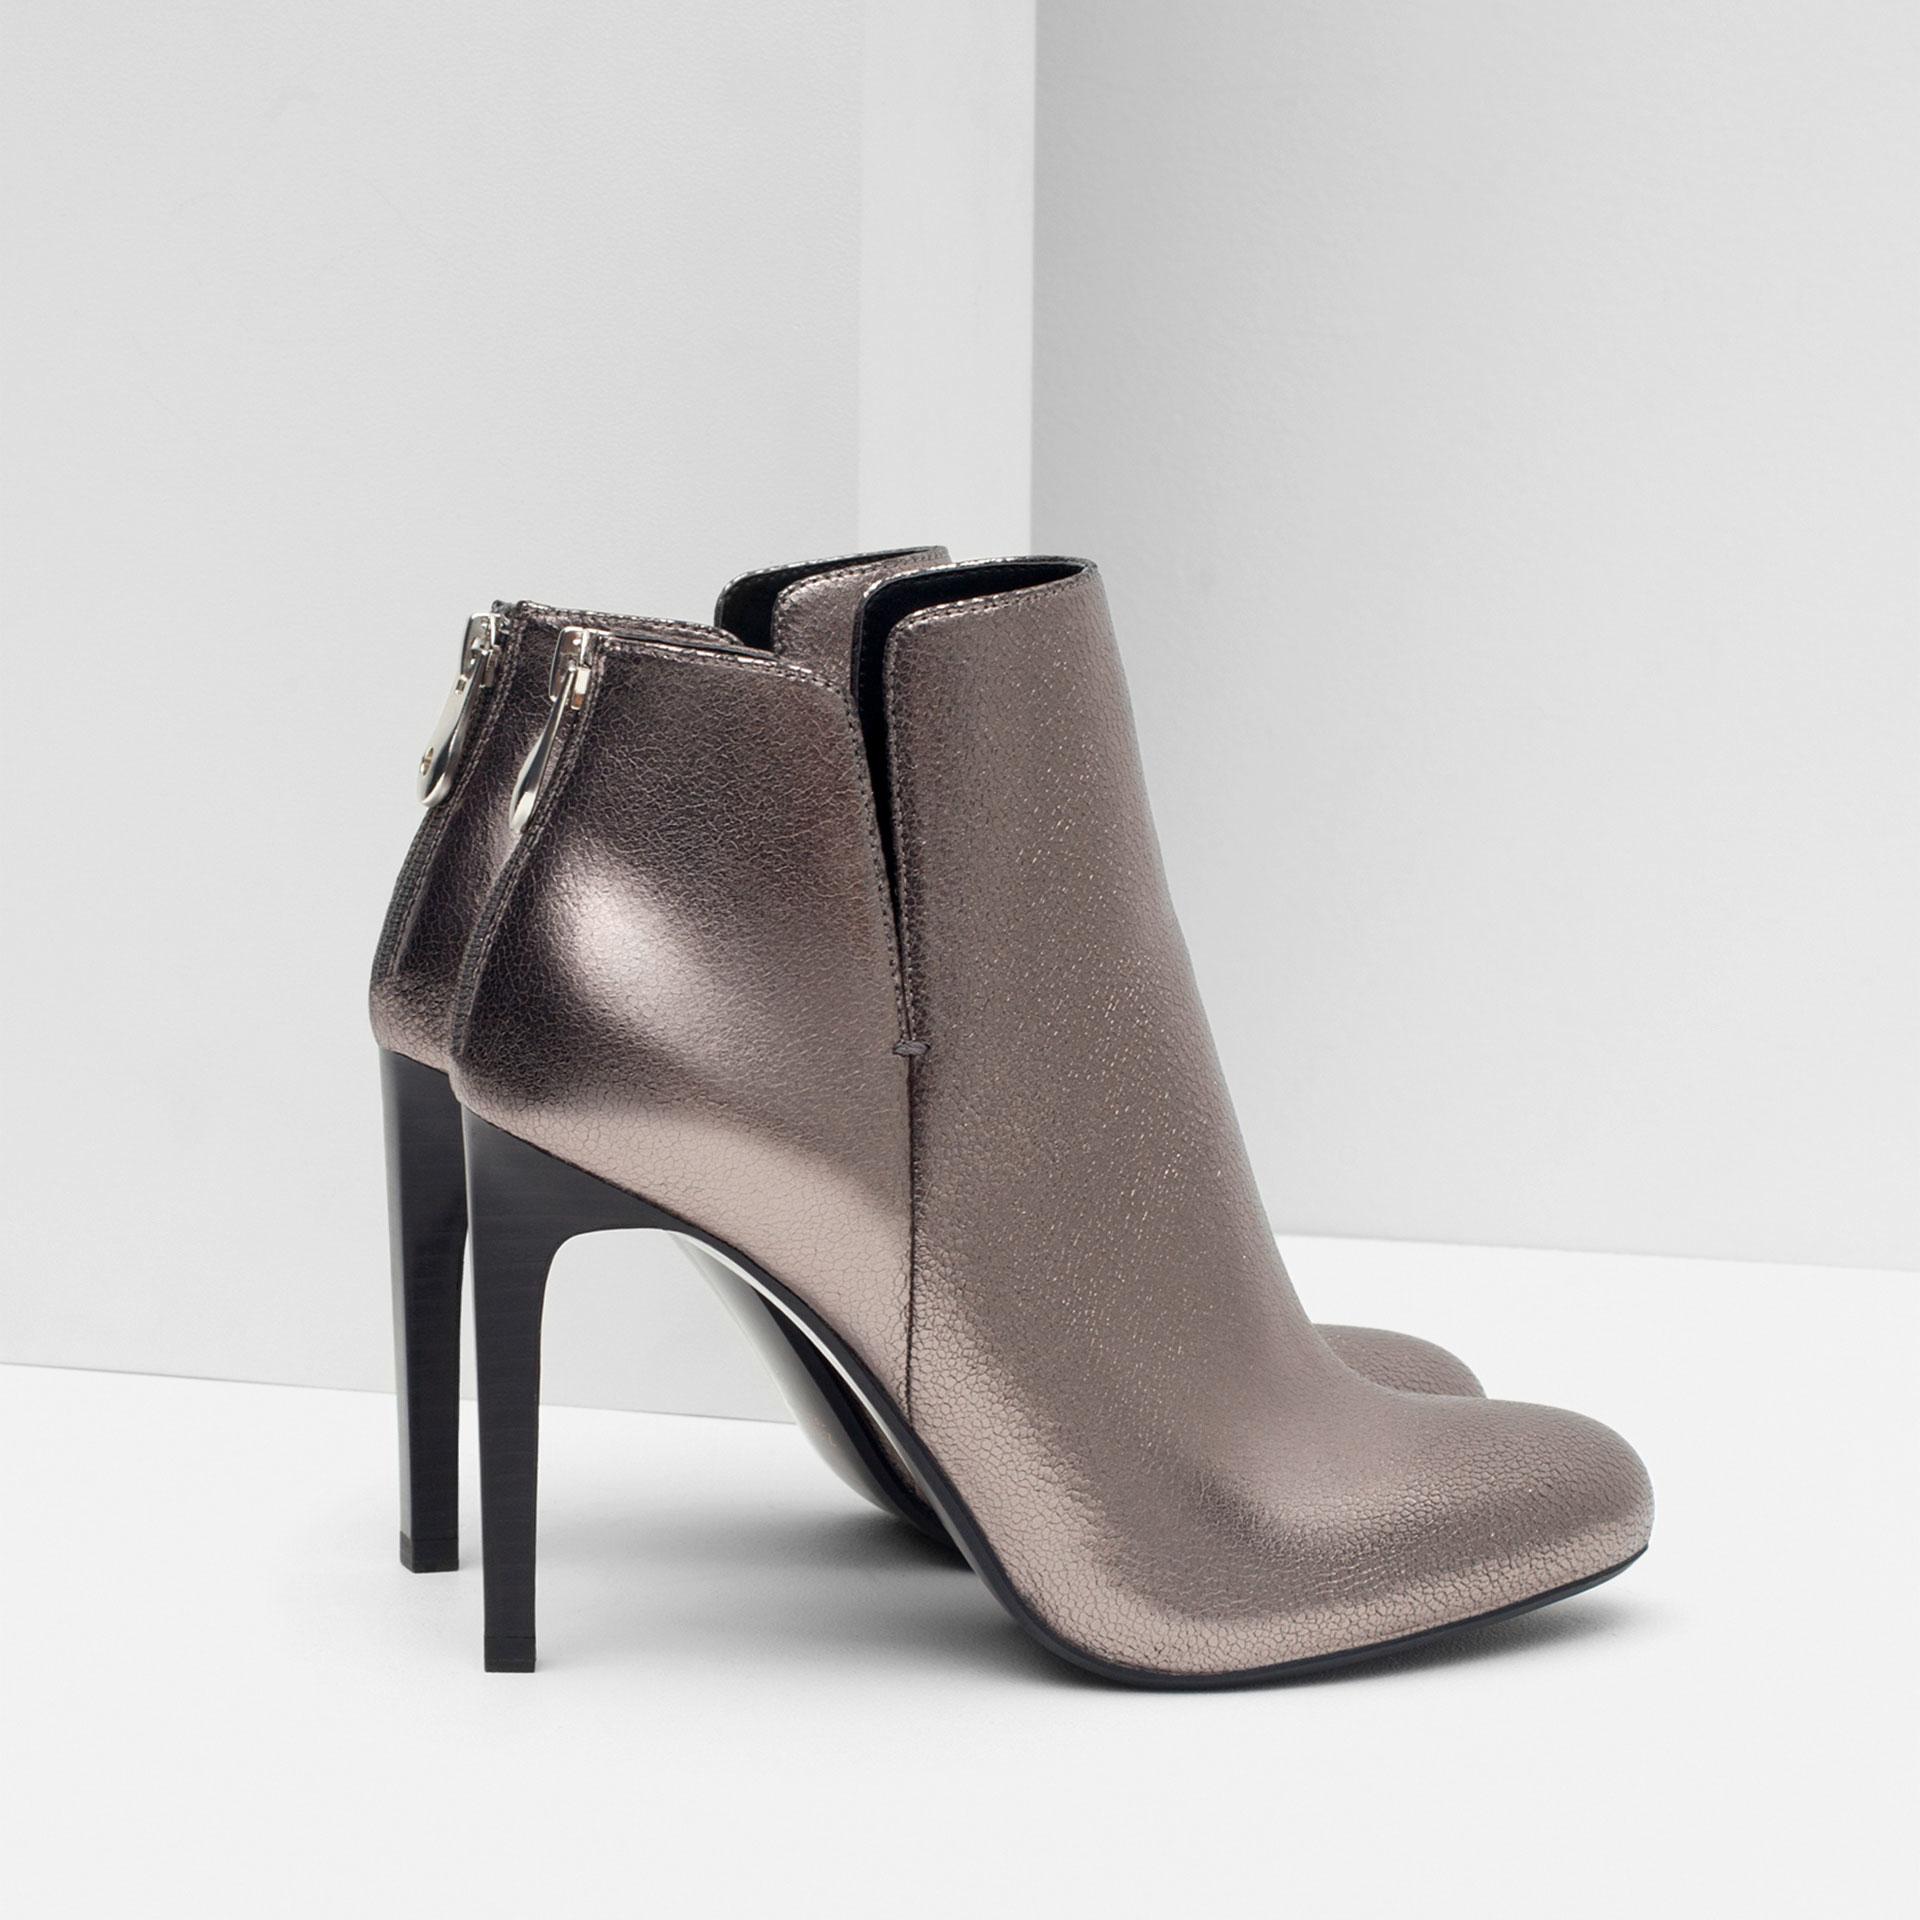 Fantastic Women39s Zara Shoe Ankle Boot Size 7 EU 40 2 2 Of 4 Women39s Zara Shoe